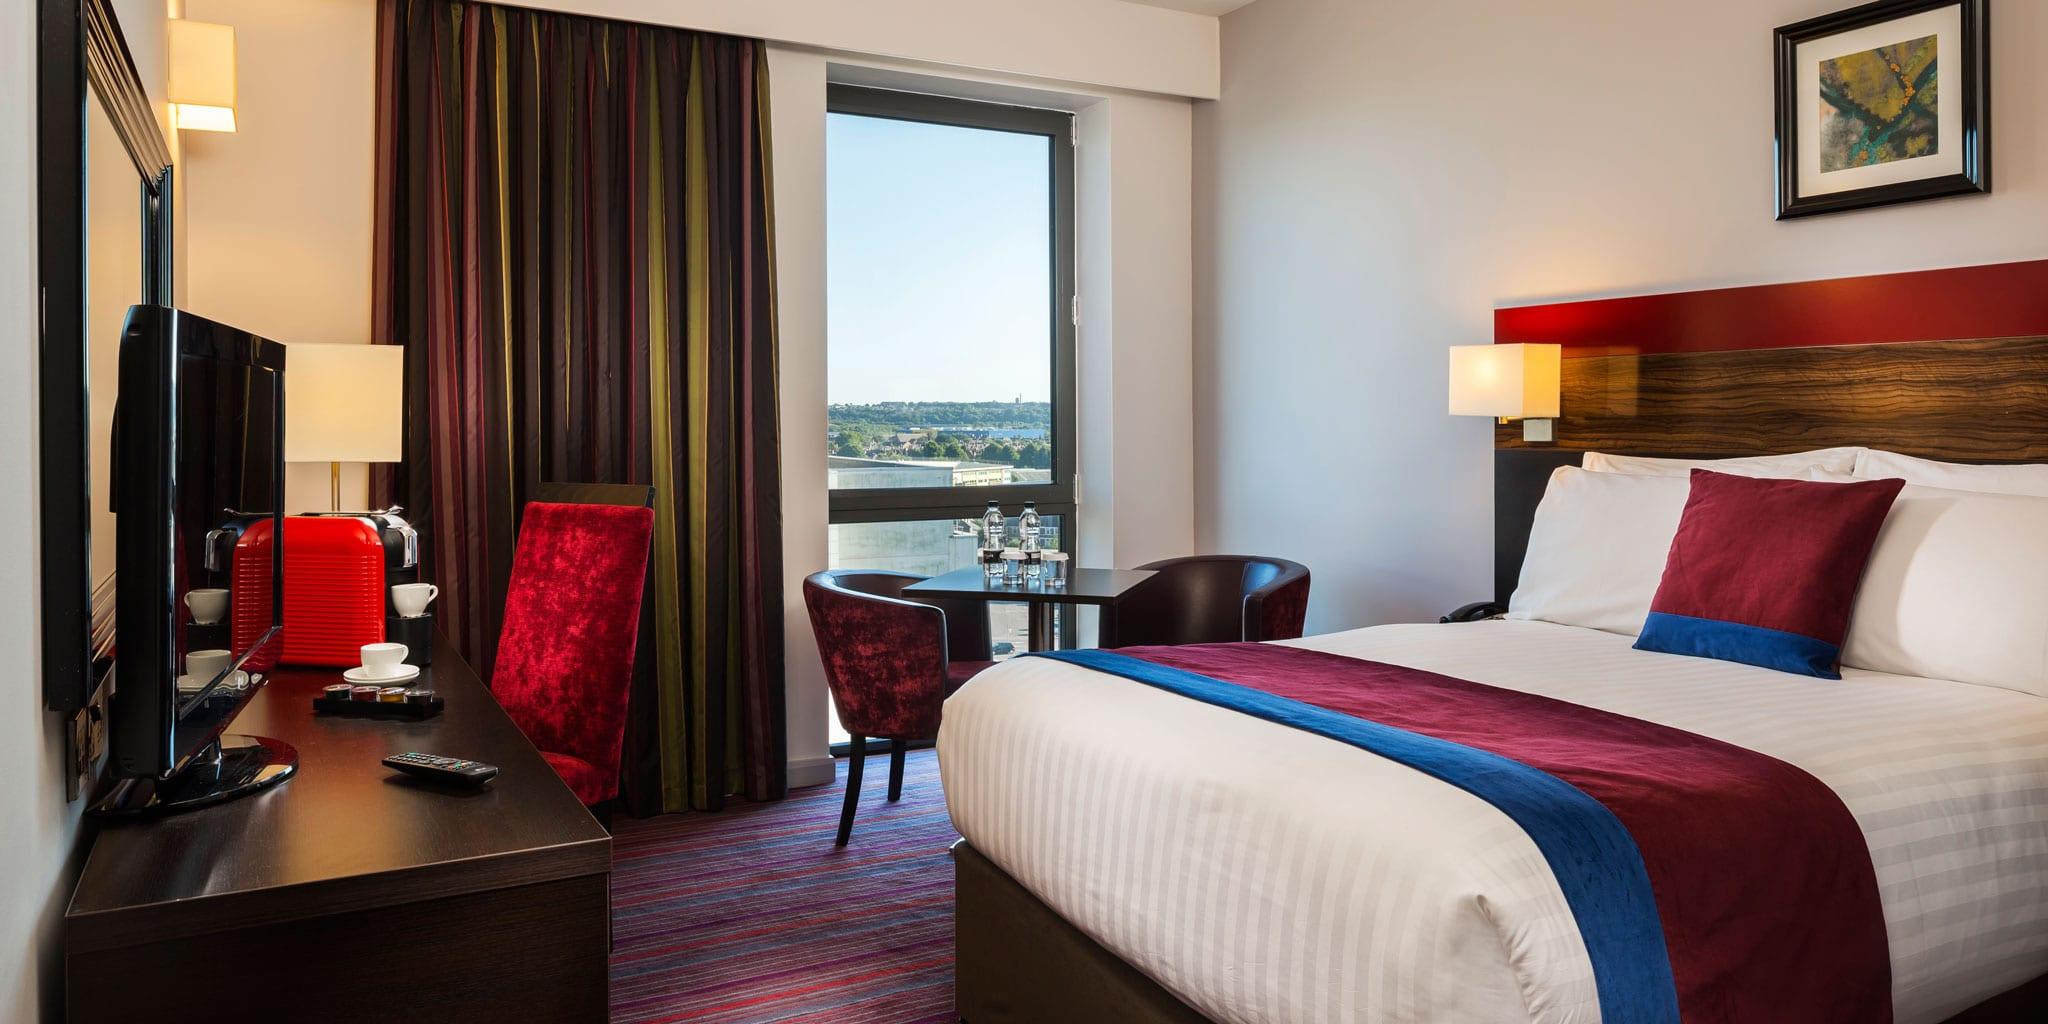 clayton-hotel-cardiff-room